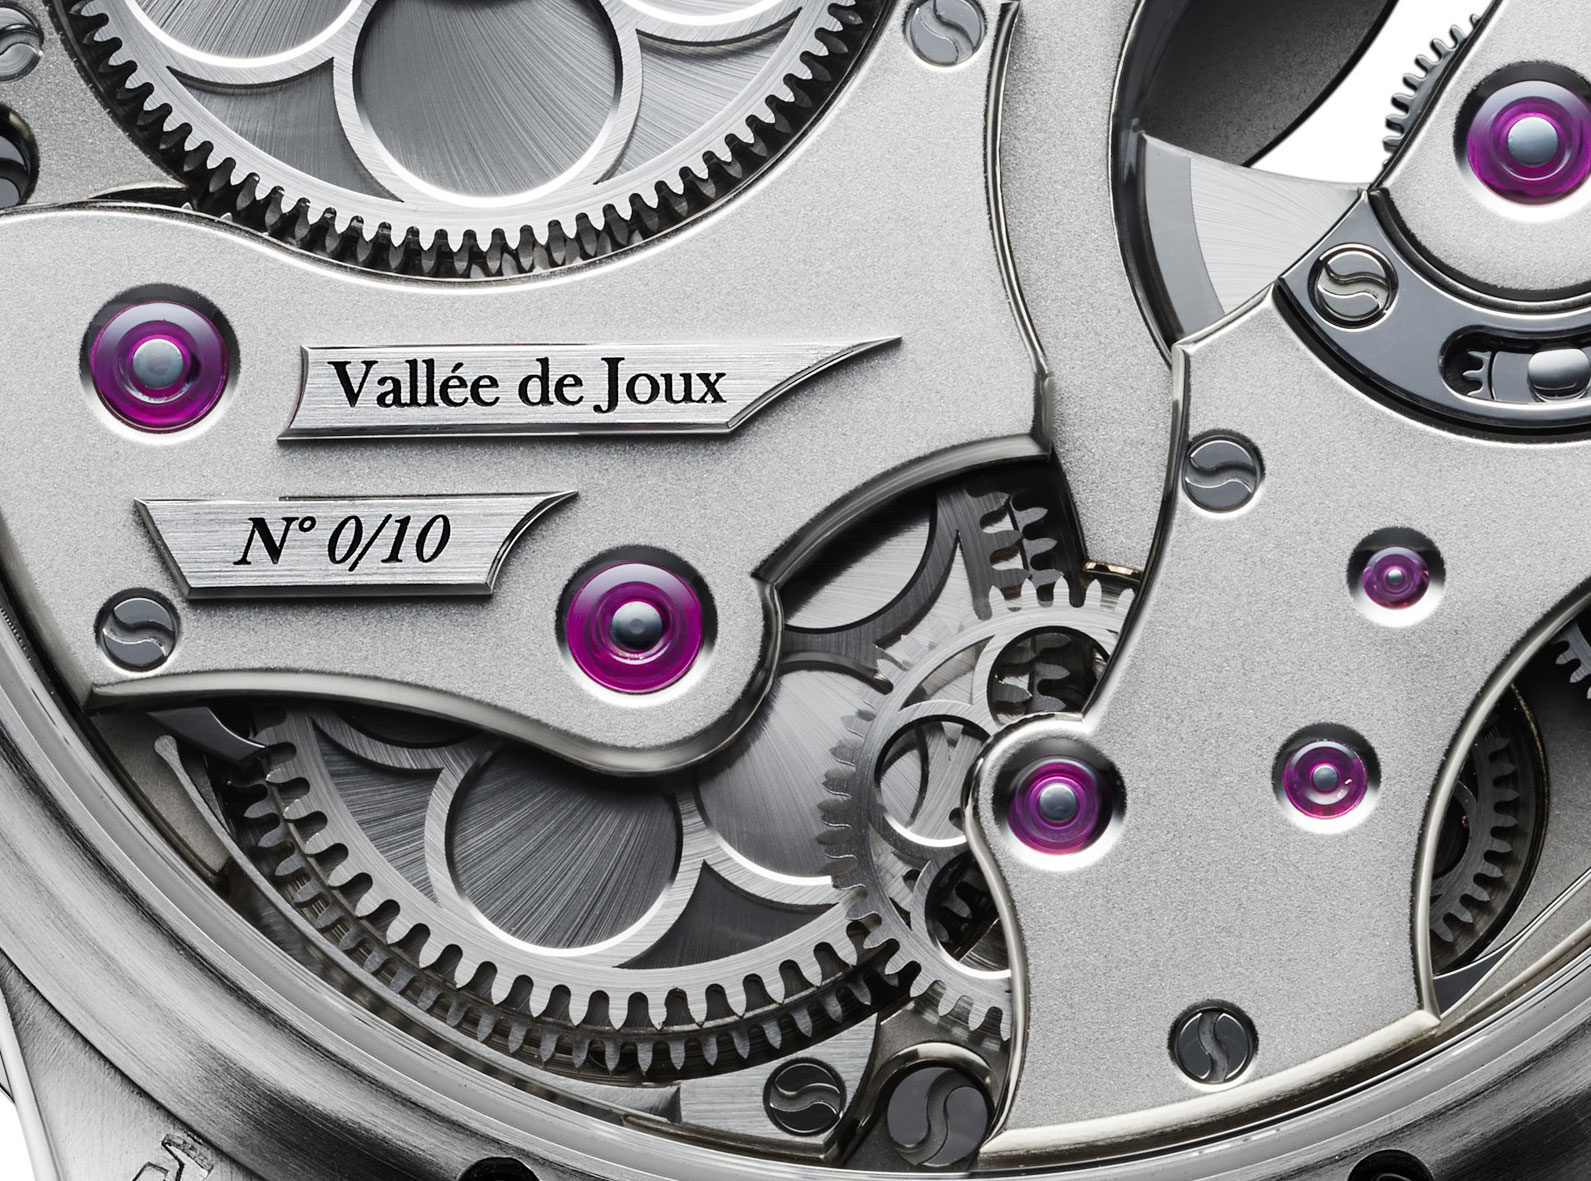 Romain Gauthier Insight Micro-Rotor 3